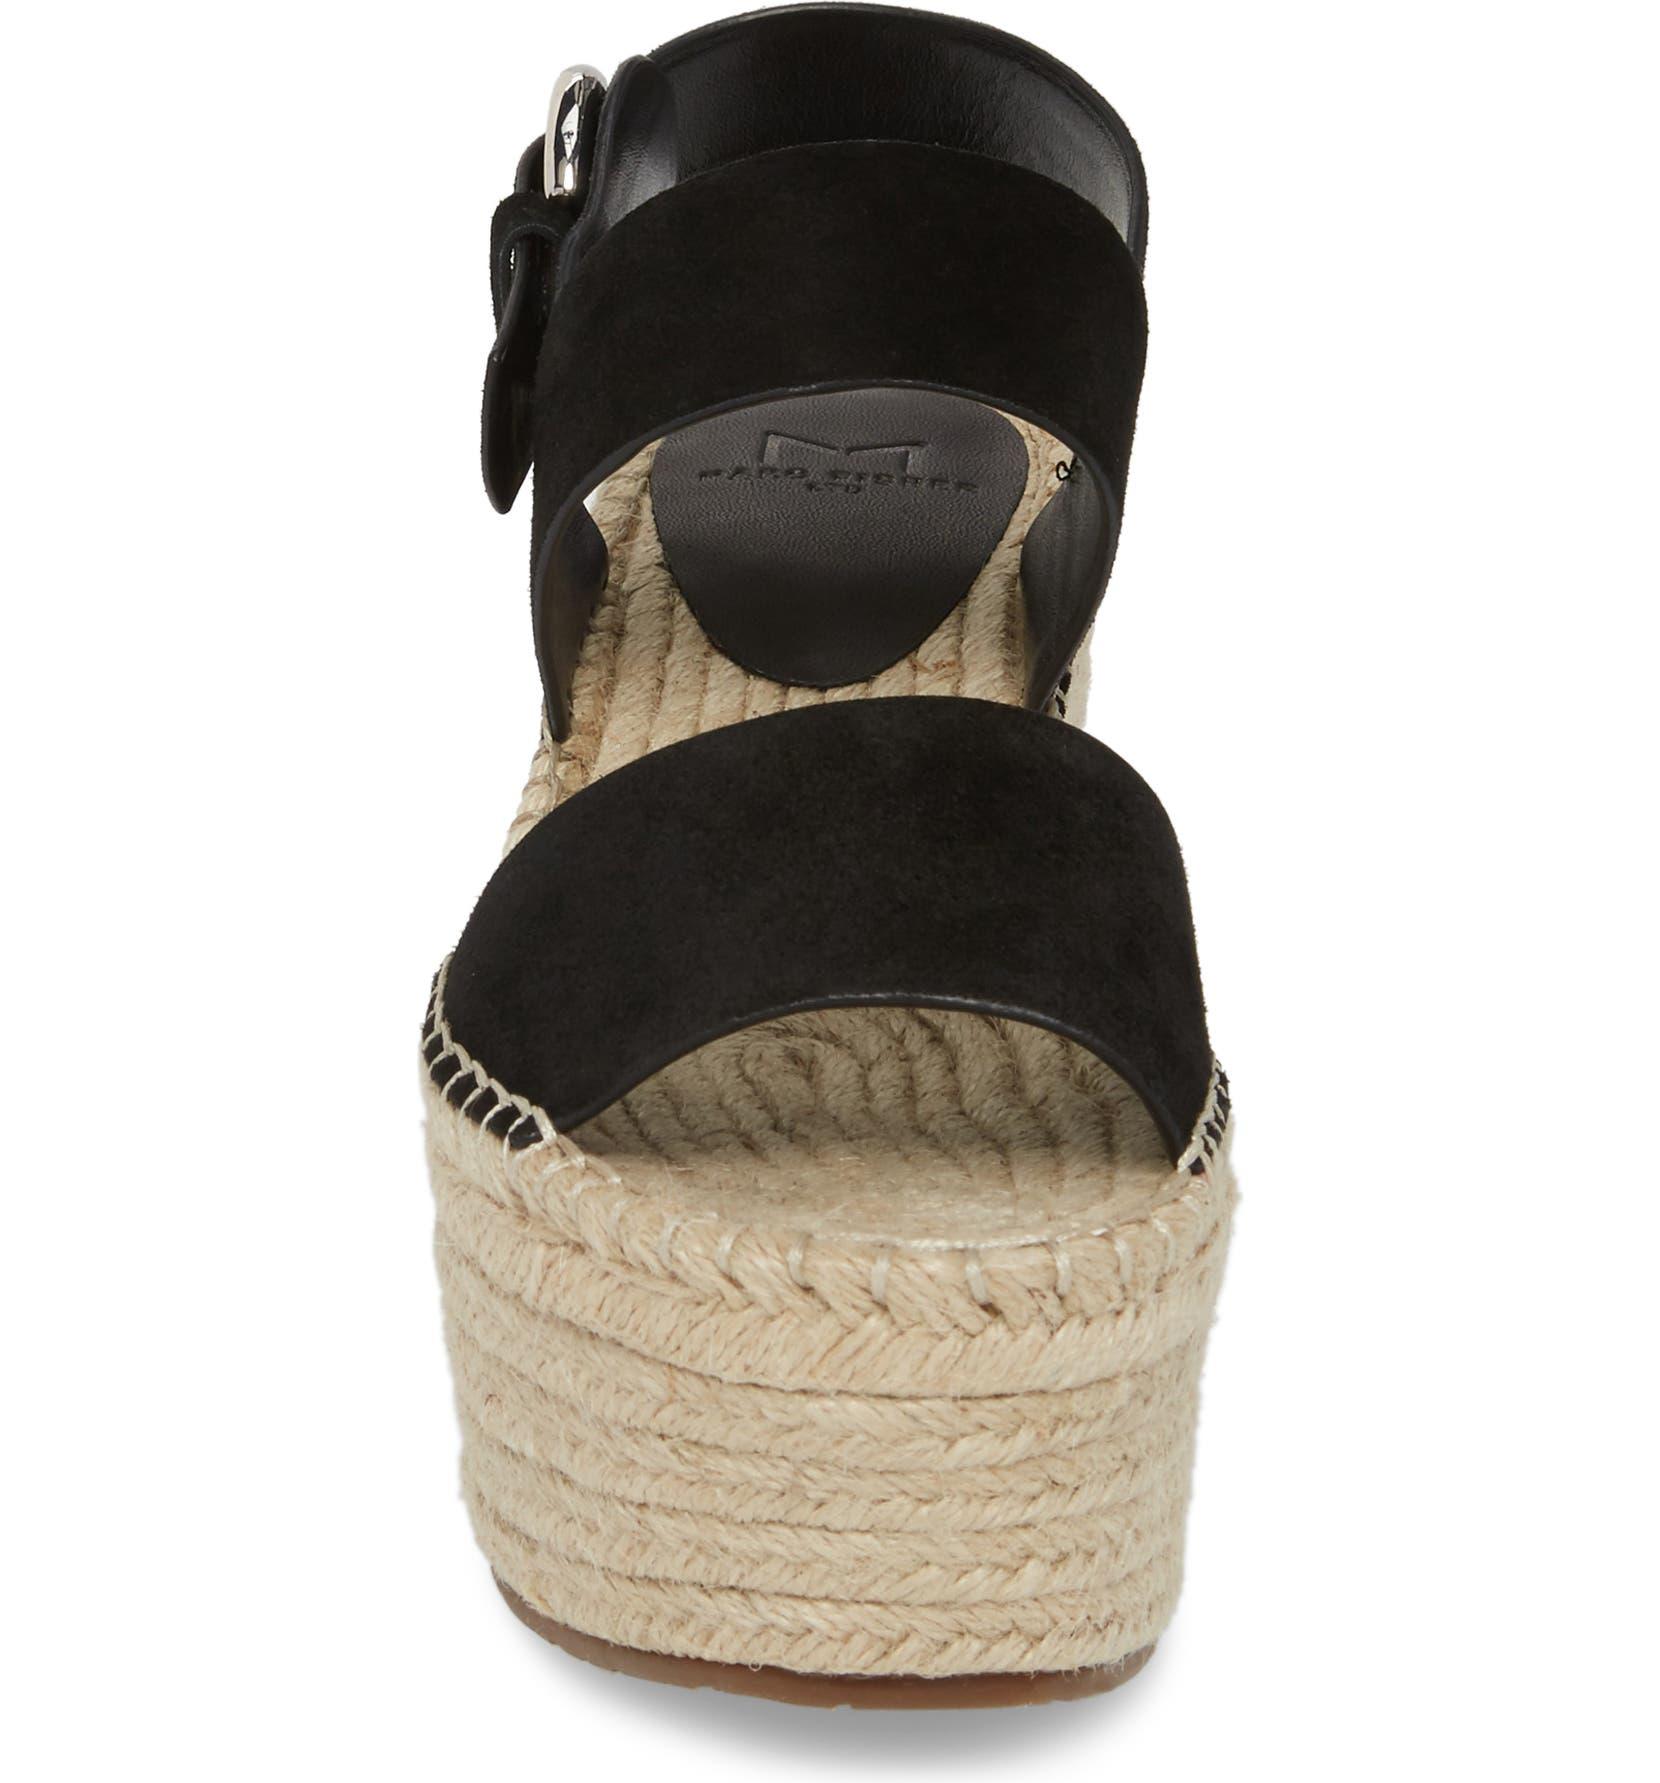 0d583fd728e Marc Fisher LTD Renni Espadrille Platform Wedge Sandal (Women ...